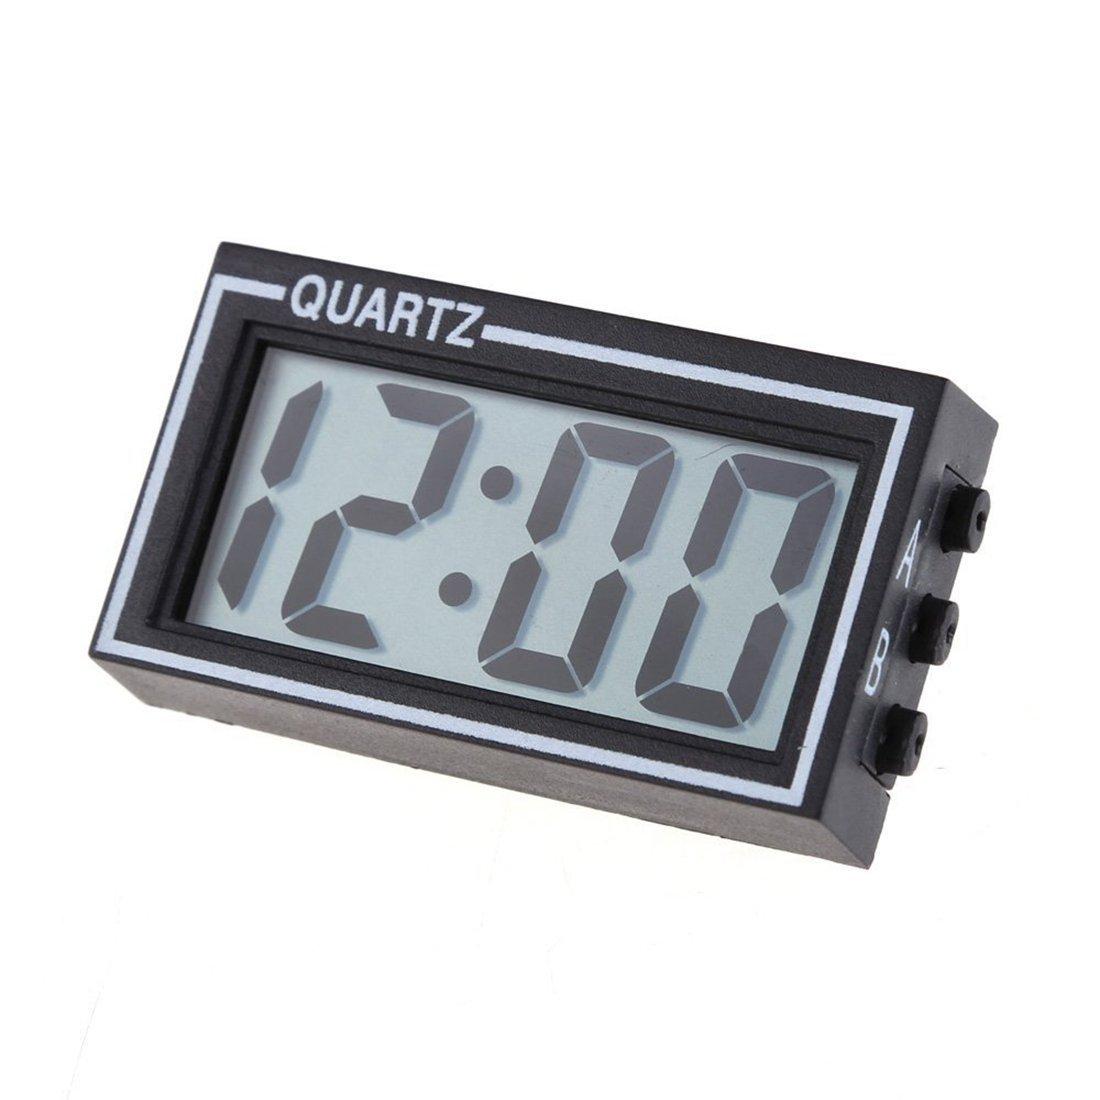 LCD Car Dashboard - TOOGOO(R)Mini Digital LCD Auto Car Truck Dashboard Date Time Calendar Clock Black 072534